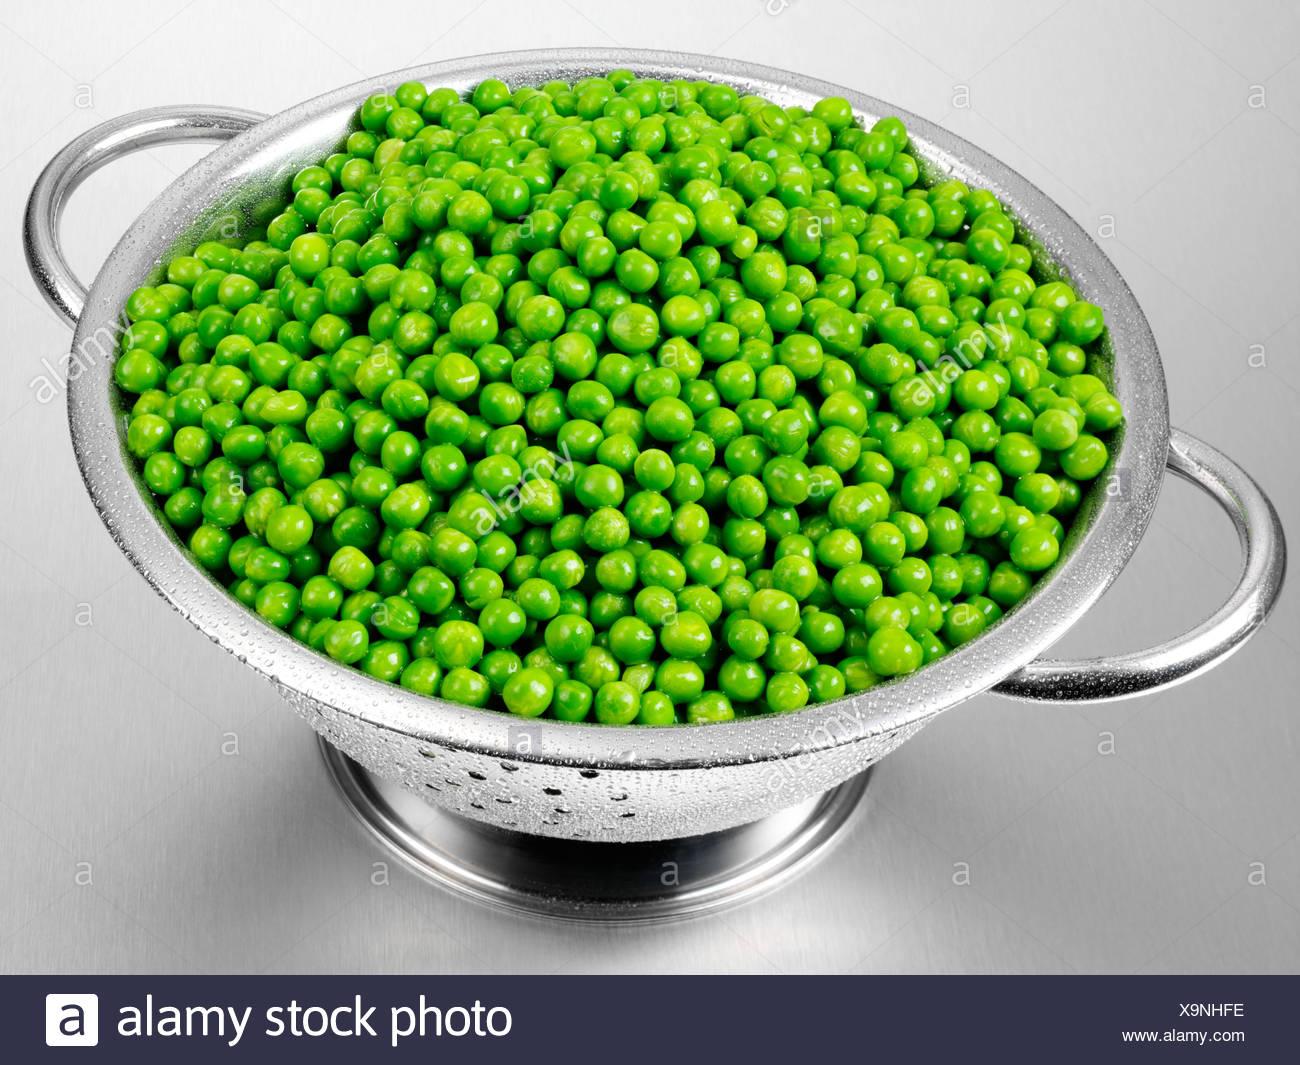 fresh garden peas in colander - Garden Peas